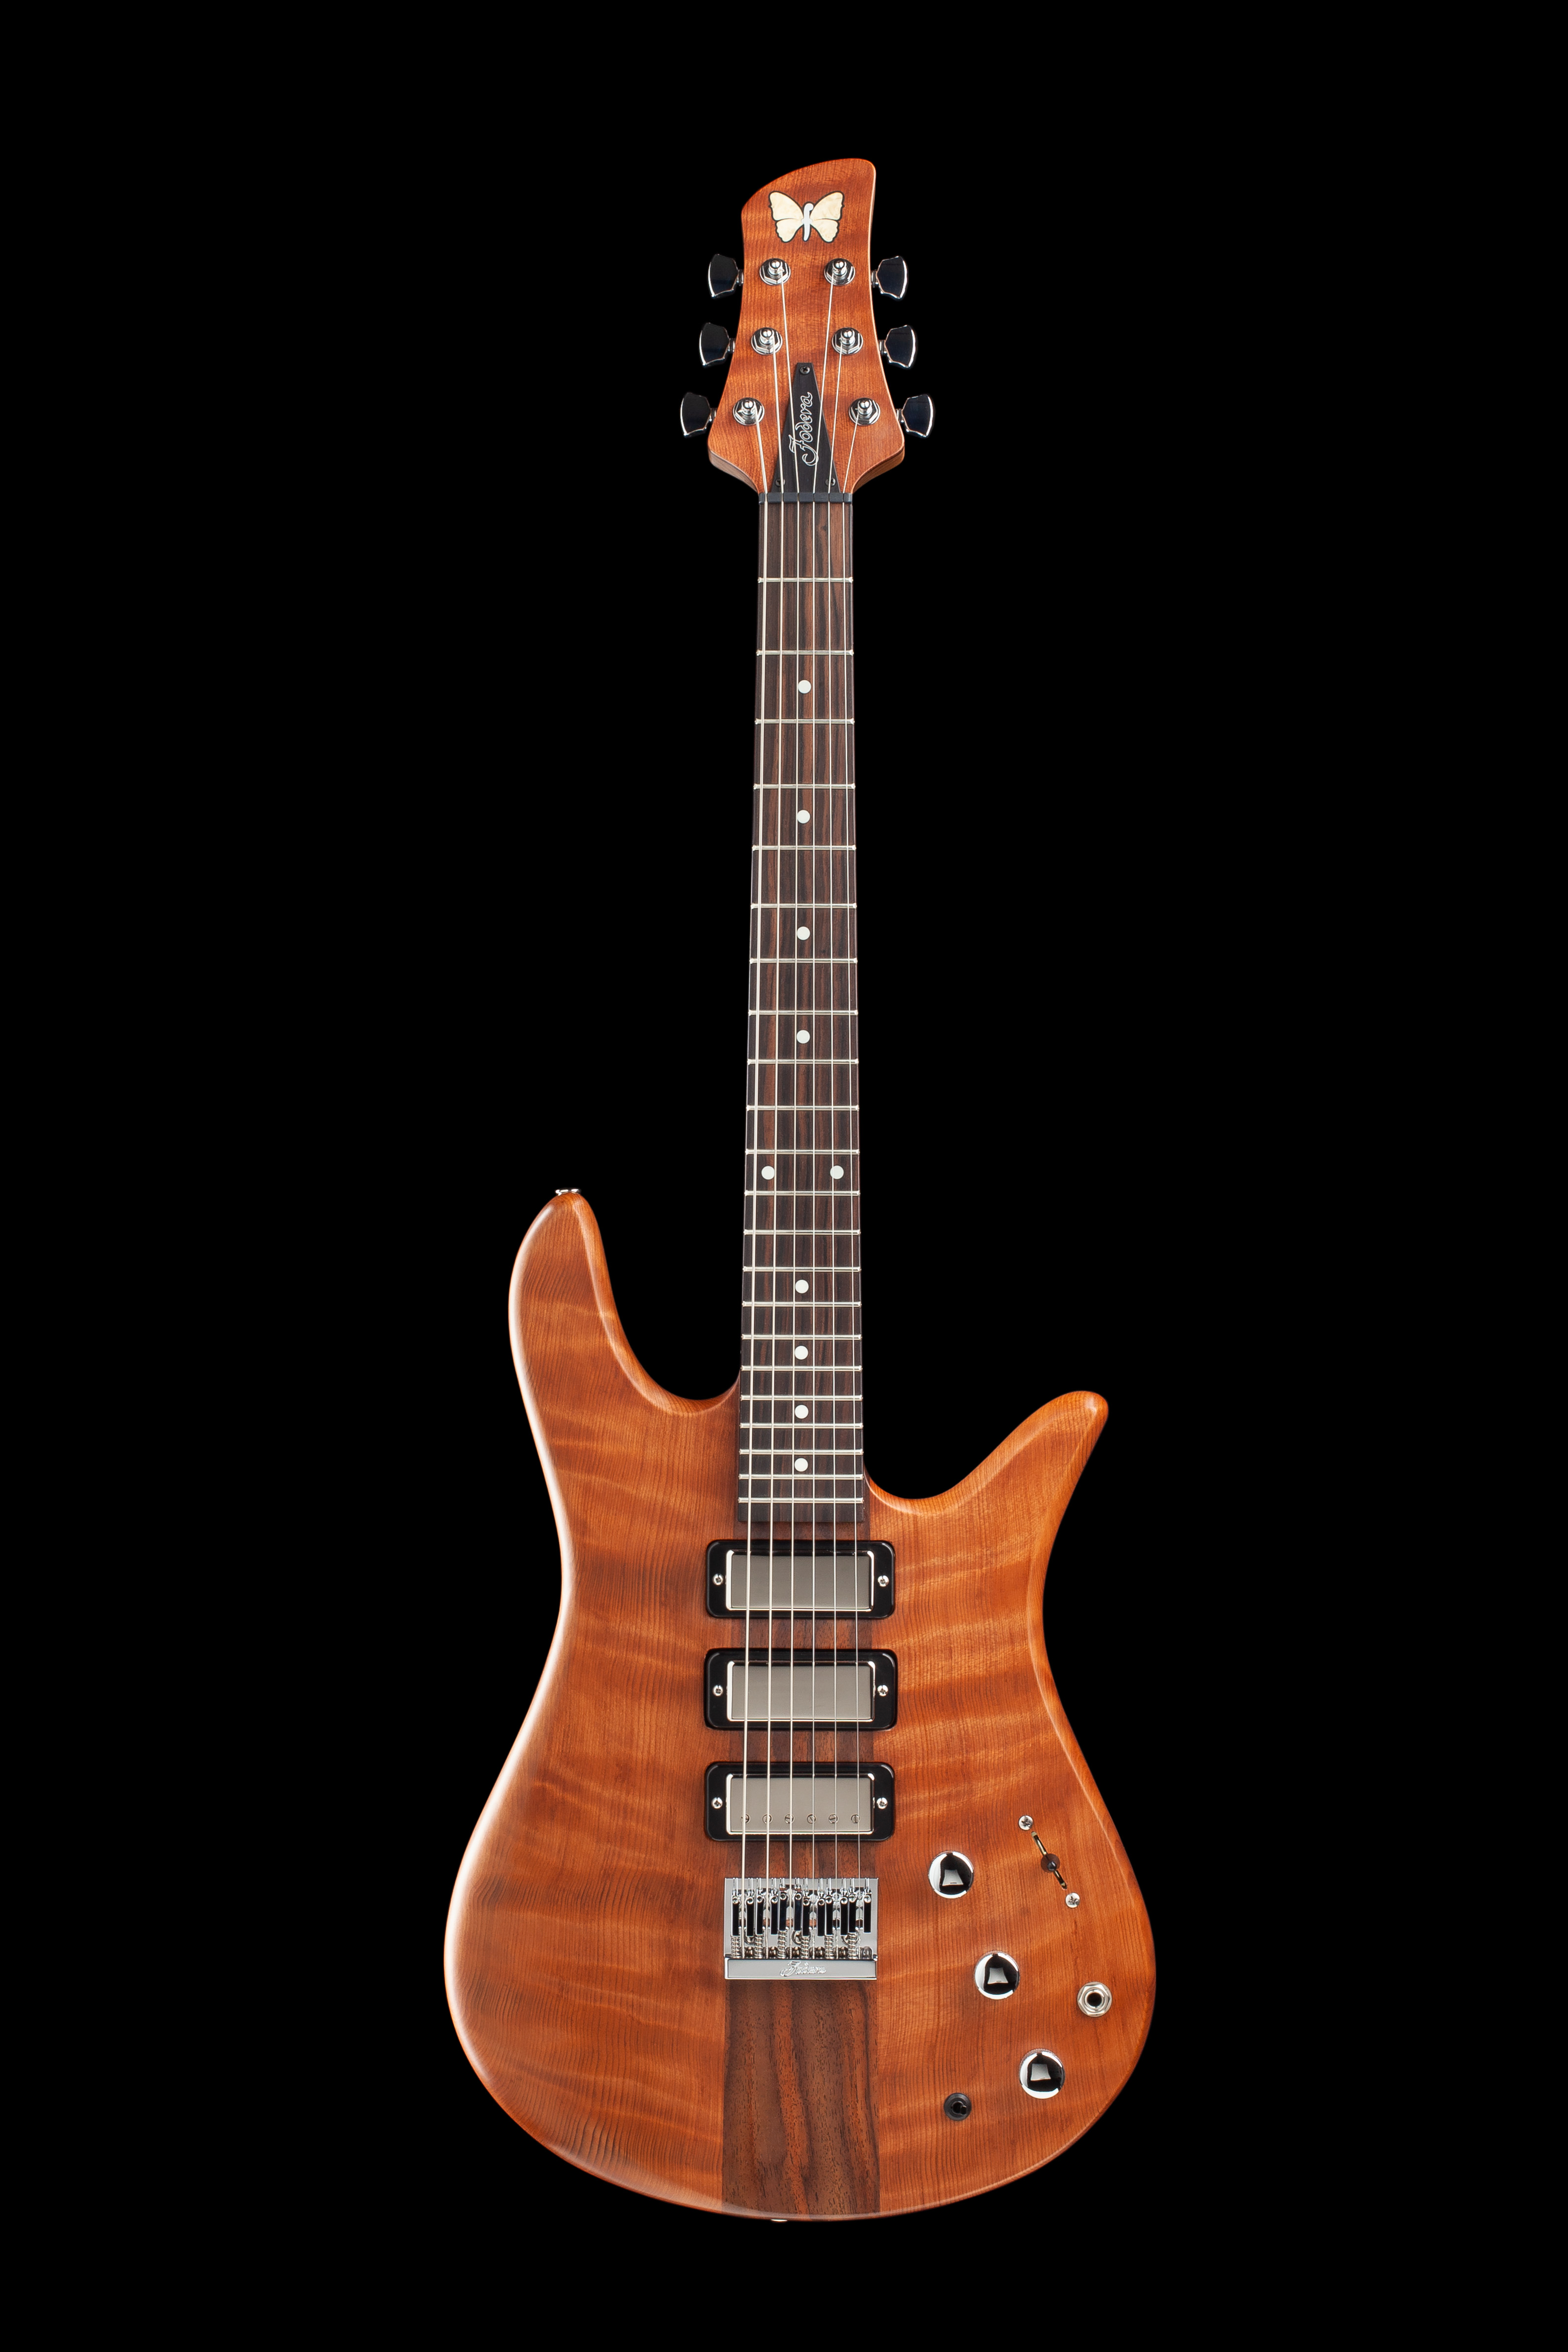 Fodera Monarch Custom Bass Guitar